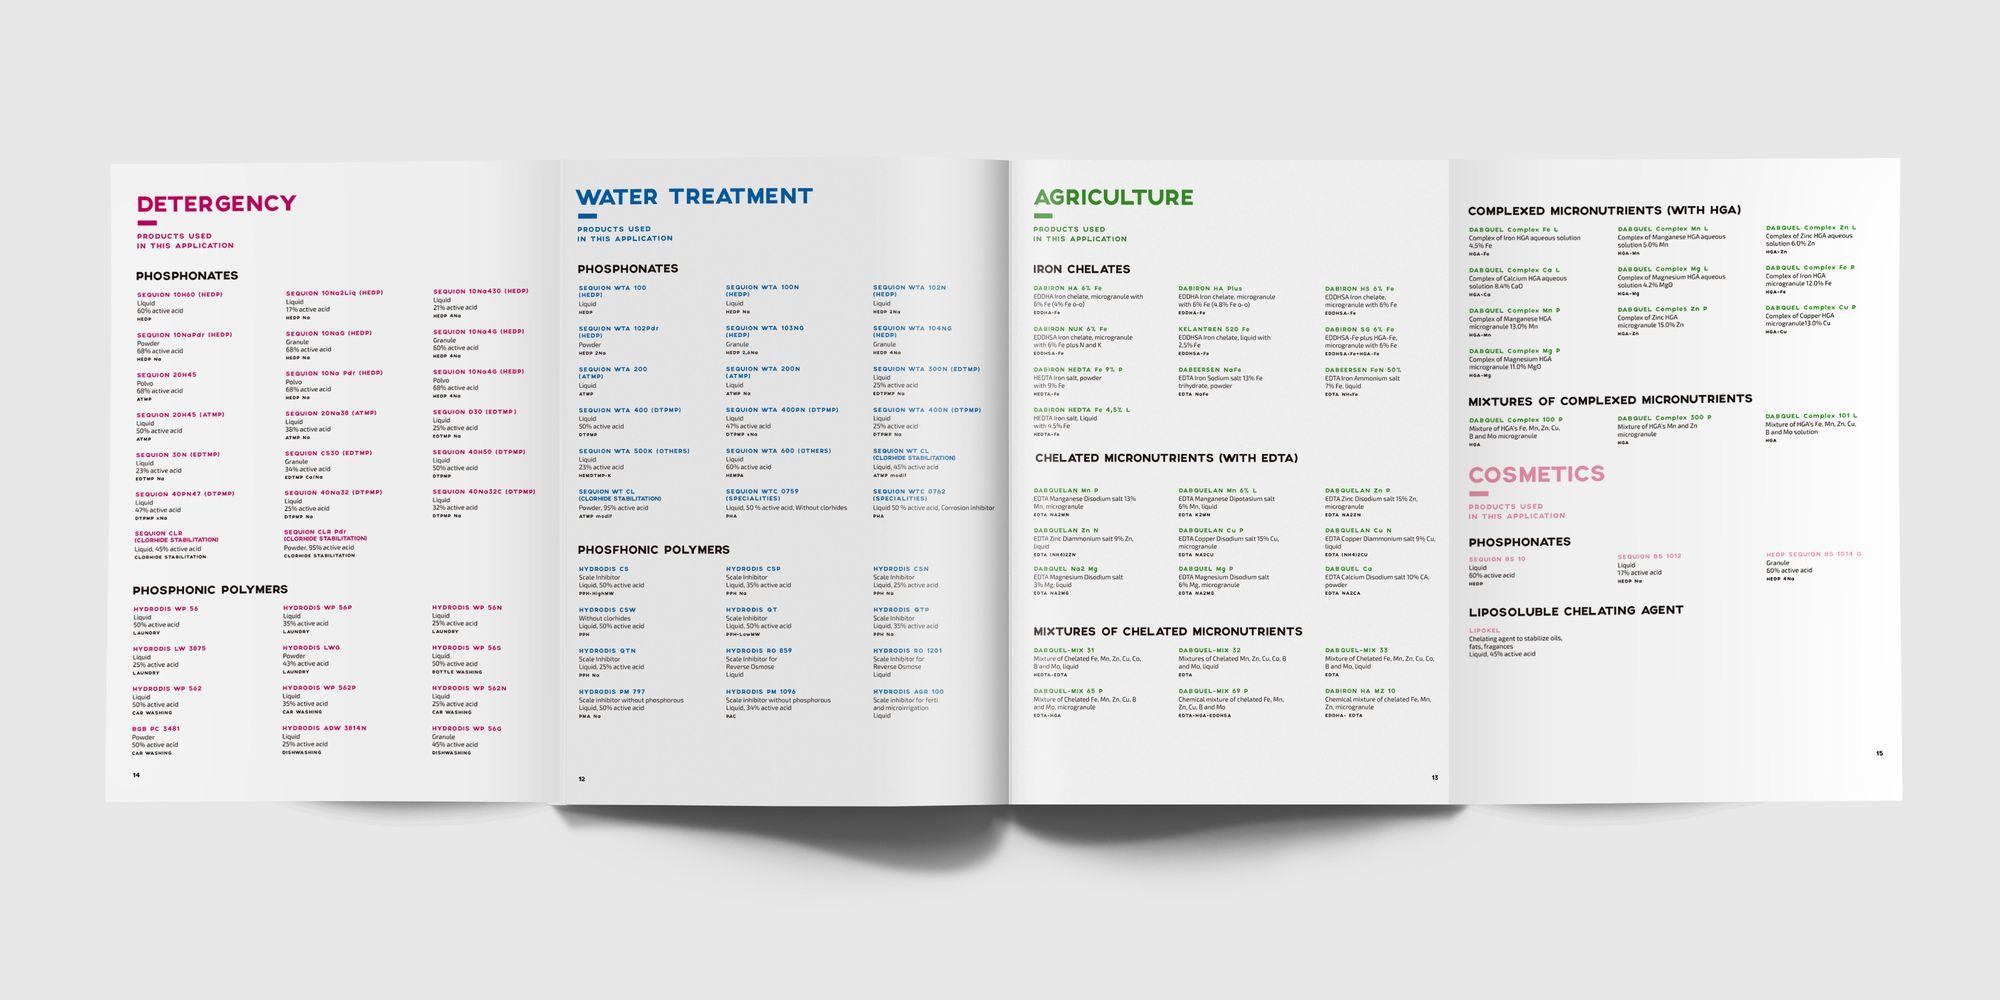 diseño grafico  Catálogo corporativo     8